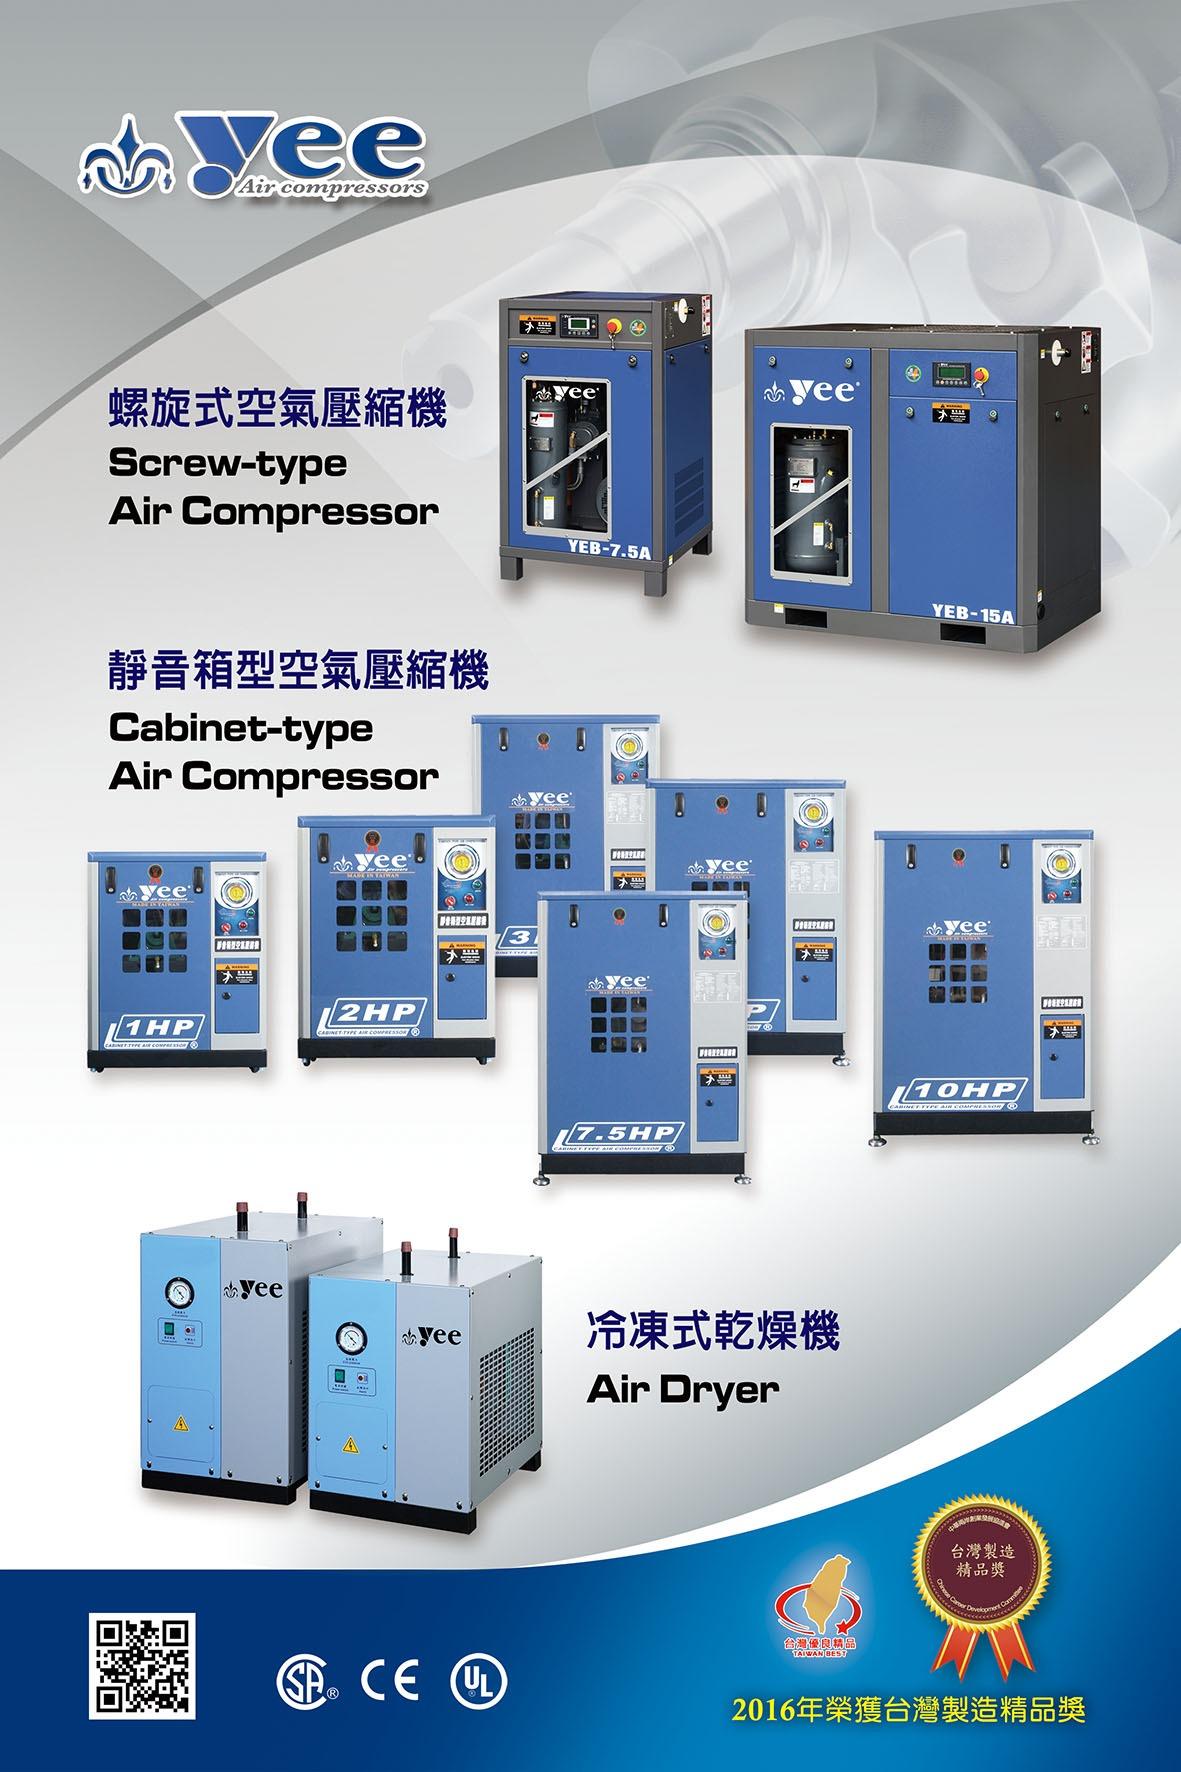 General Tools Air Compressor for Repair / Maintenance Equipment made by MIN LI ZEN CO., LTD. 敏力升企業有限公司 - MatchSupplier.com